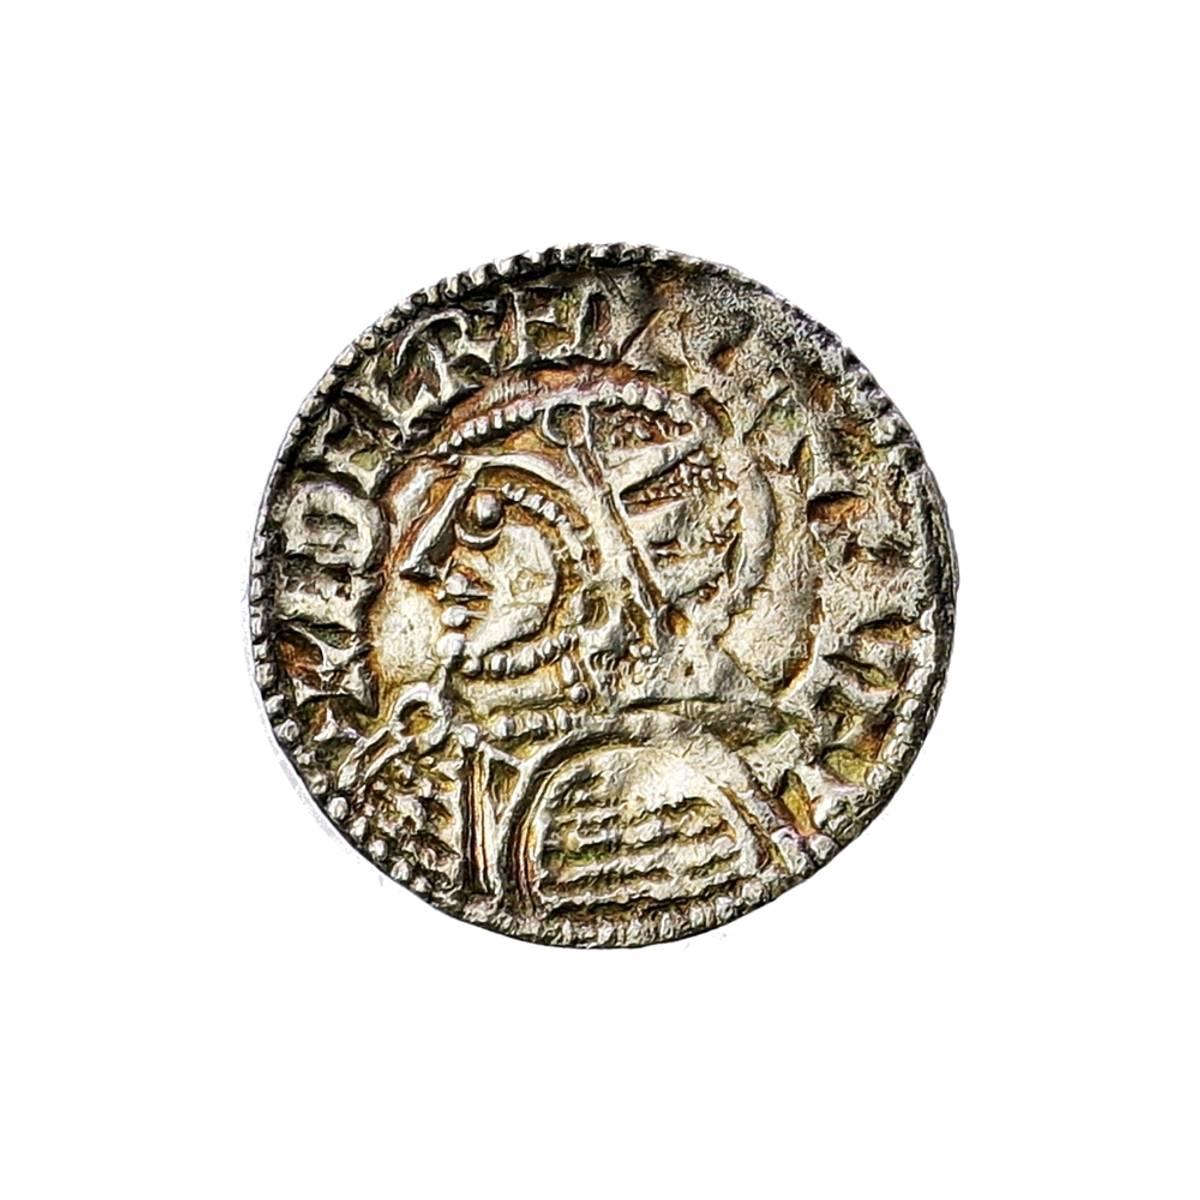 England Aethelred II Penny 978-1016 Vikingmynt